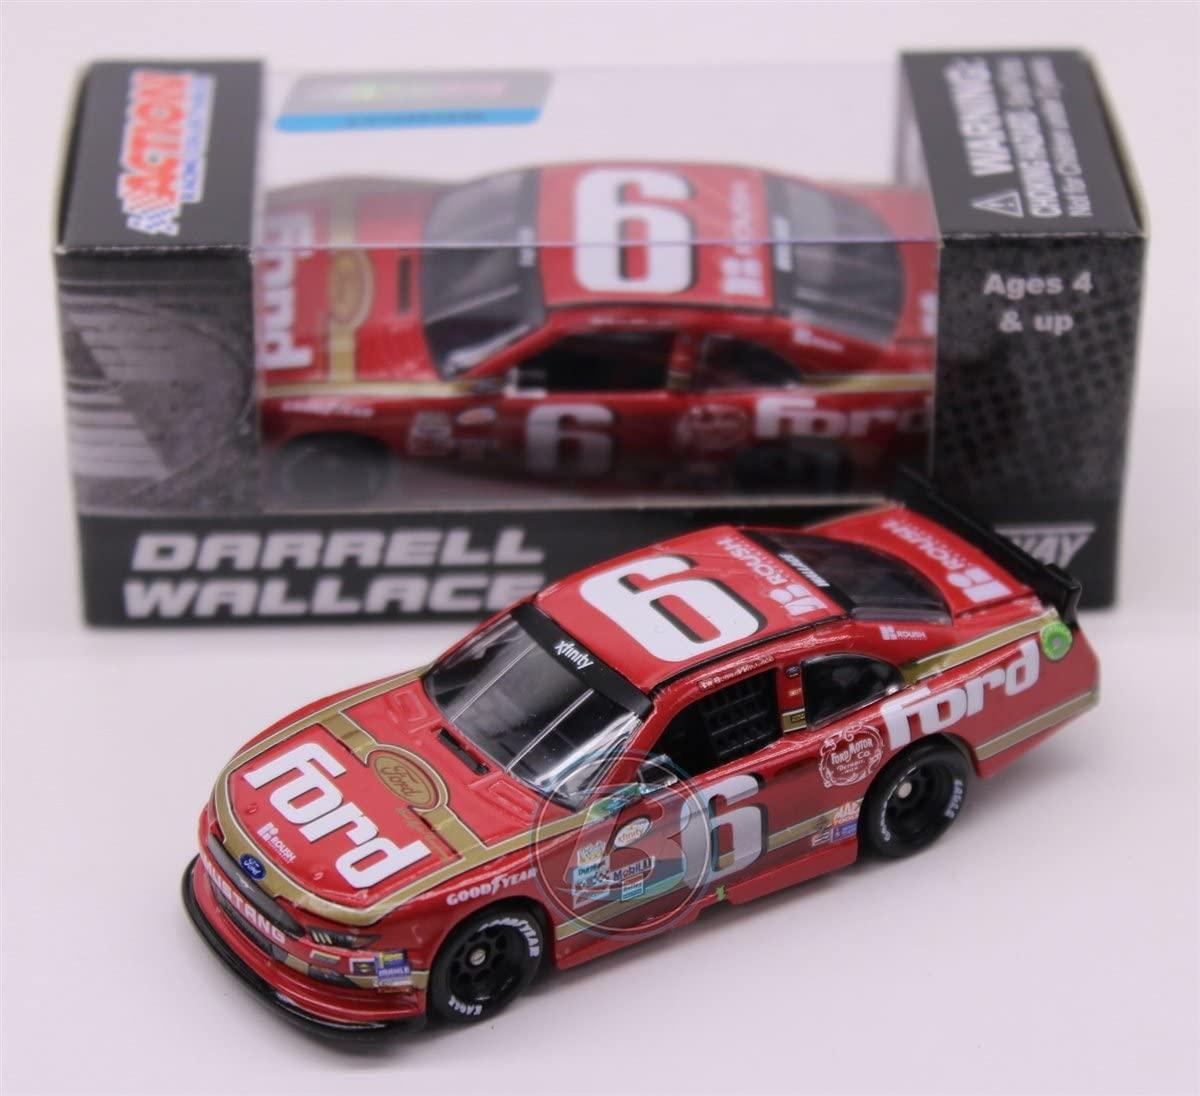 Lionel Racing Darrell Wallace Jr 2016 Ford Darlington Special 1:64 Nascar Diecast